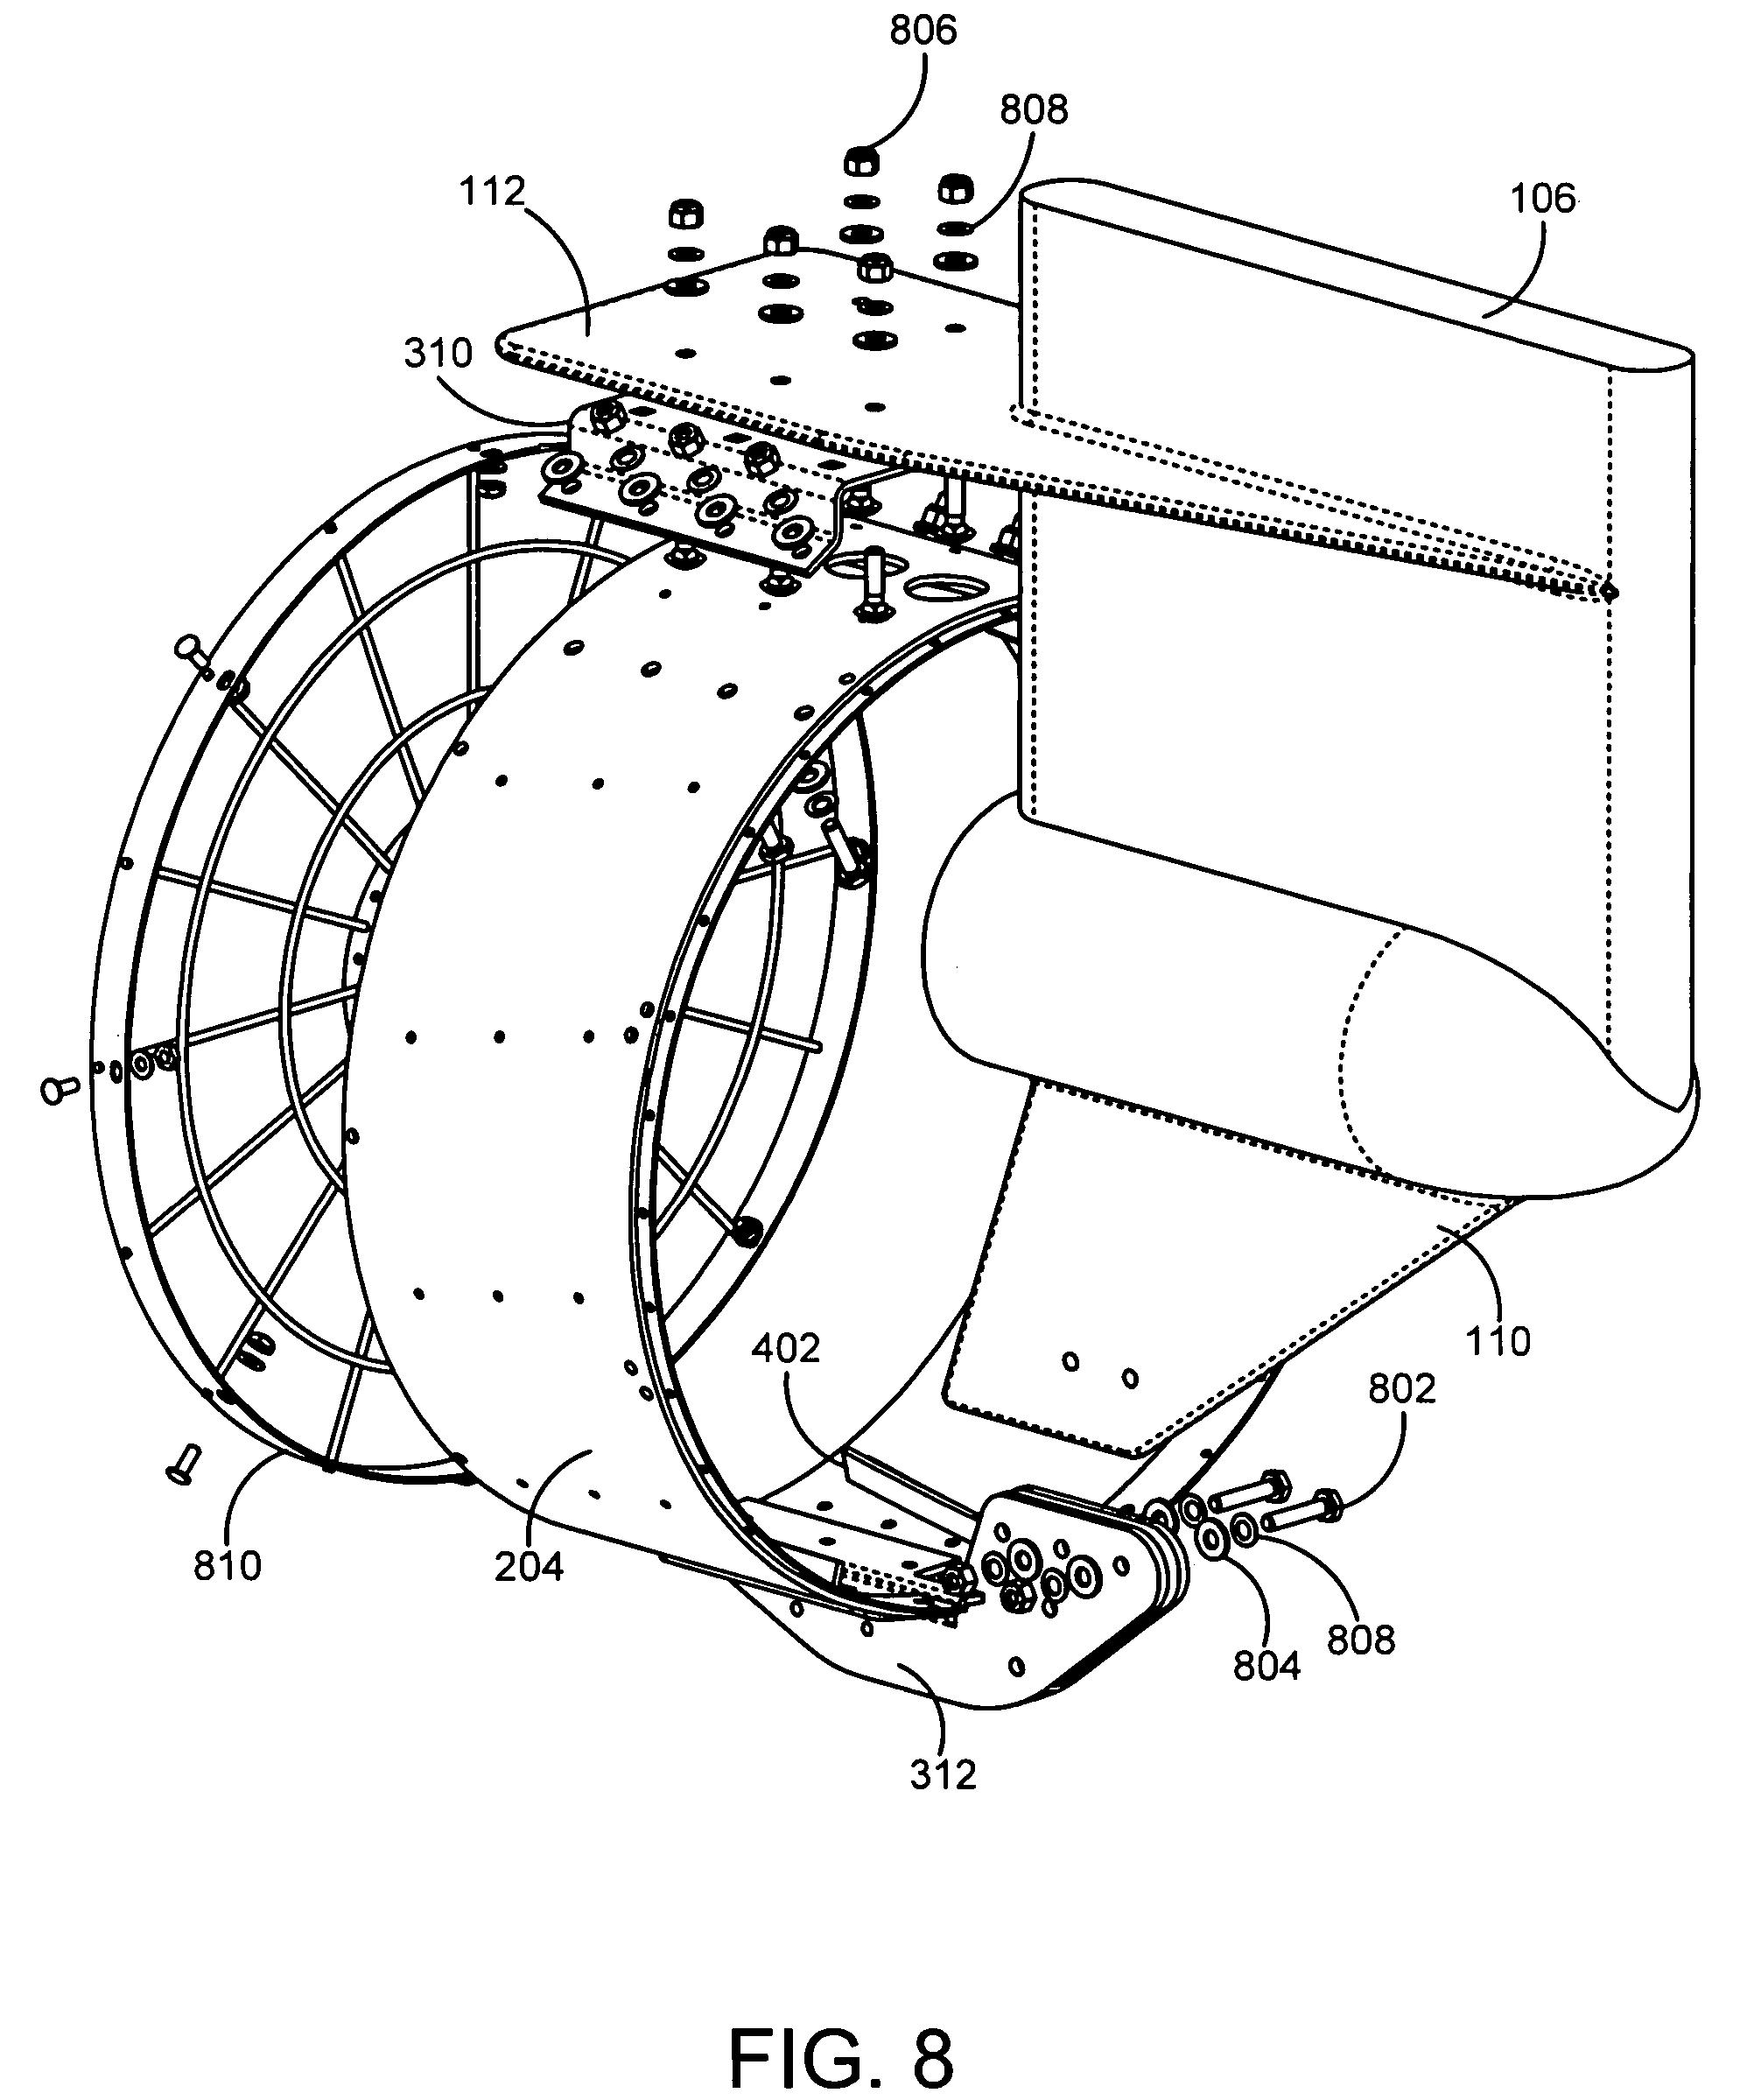 Mercruiser Trs Outdrive Diagram, Mercruiser, Free Engine